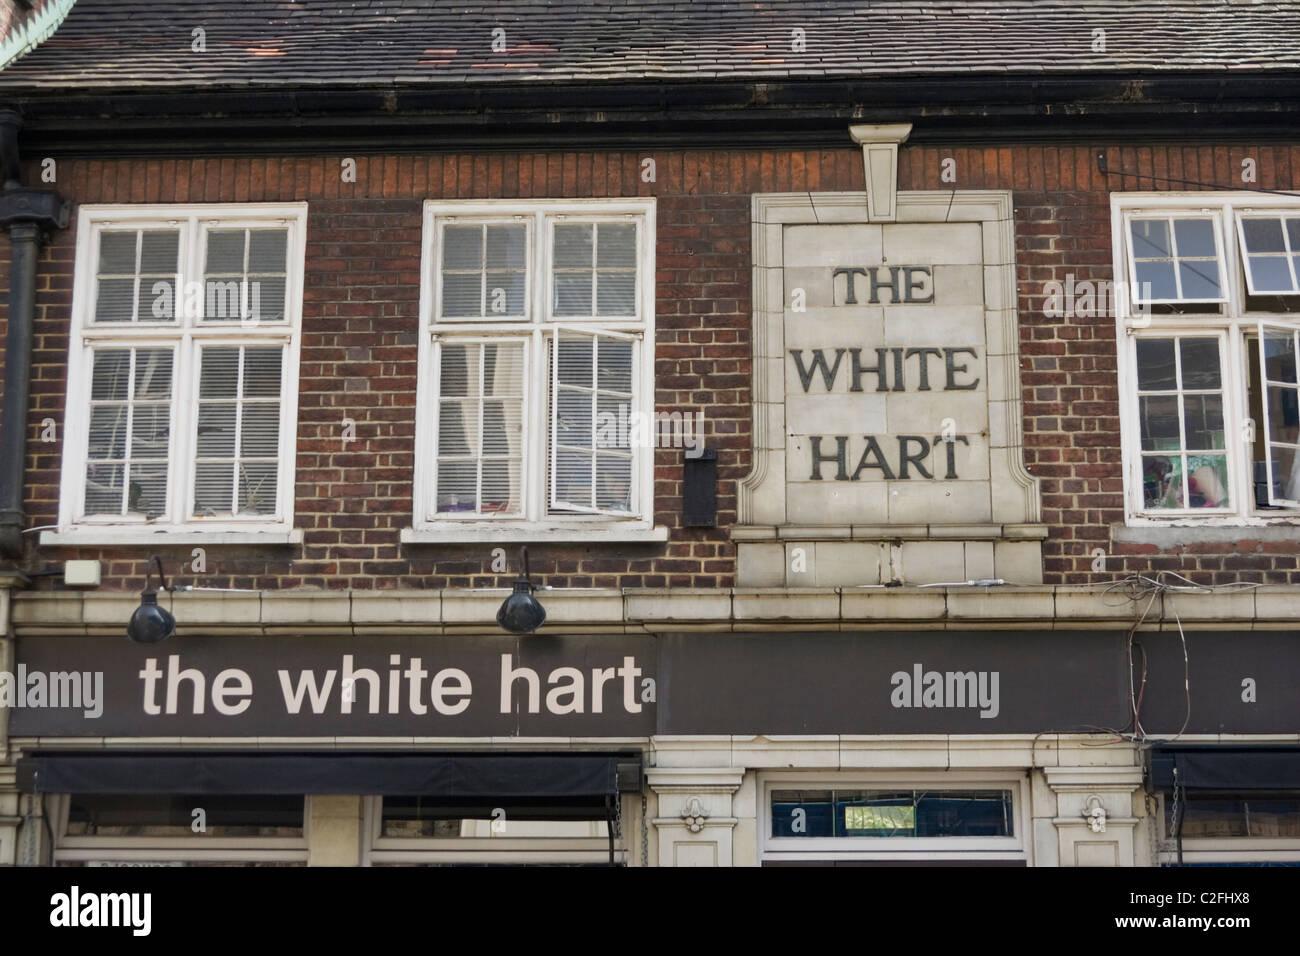 South London pub - Stock Image